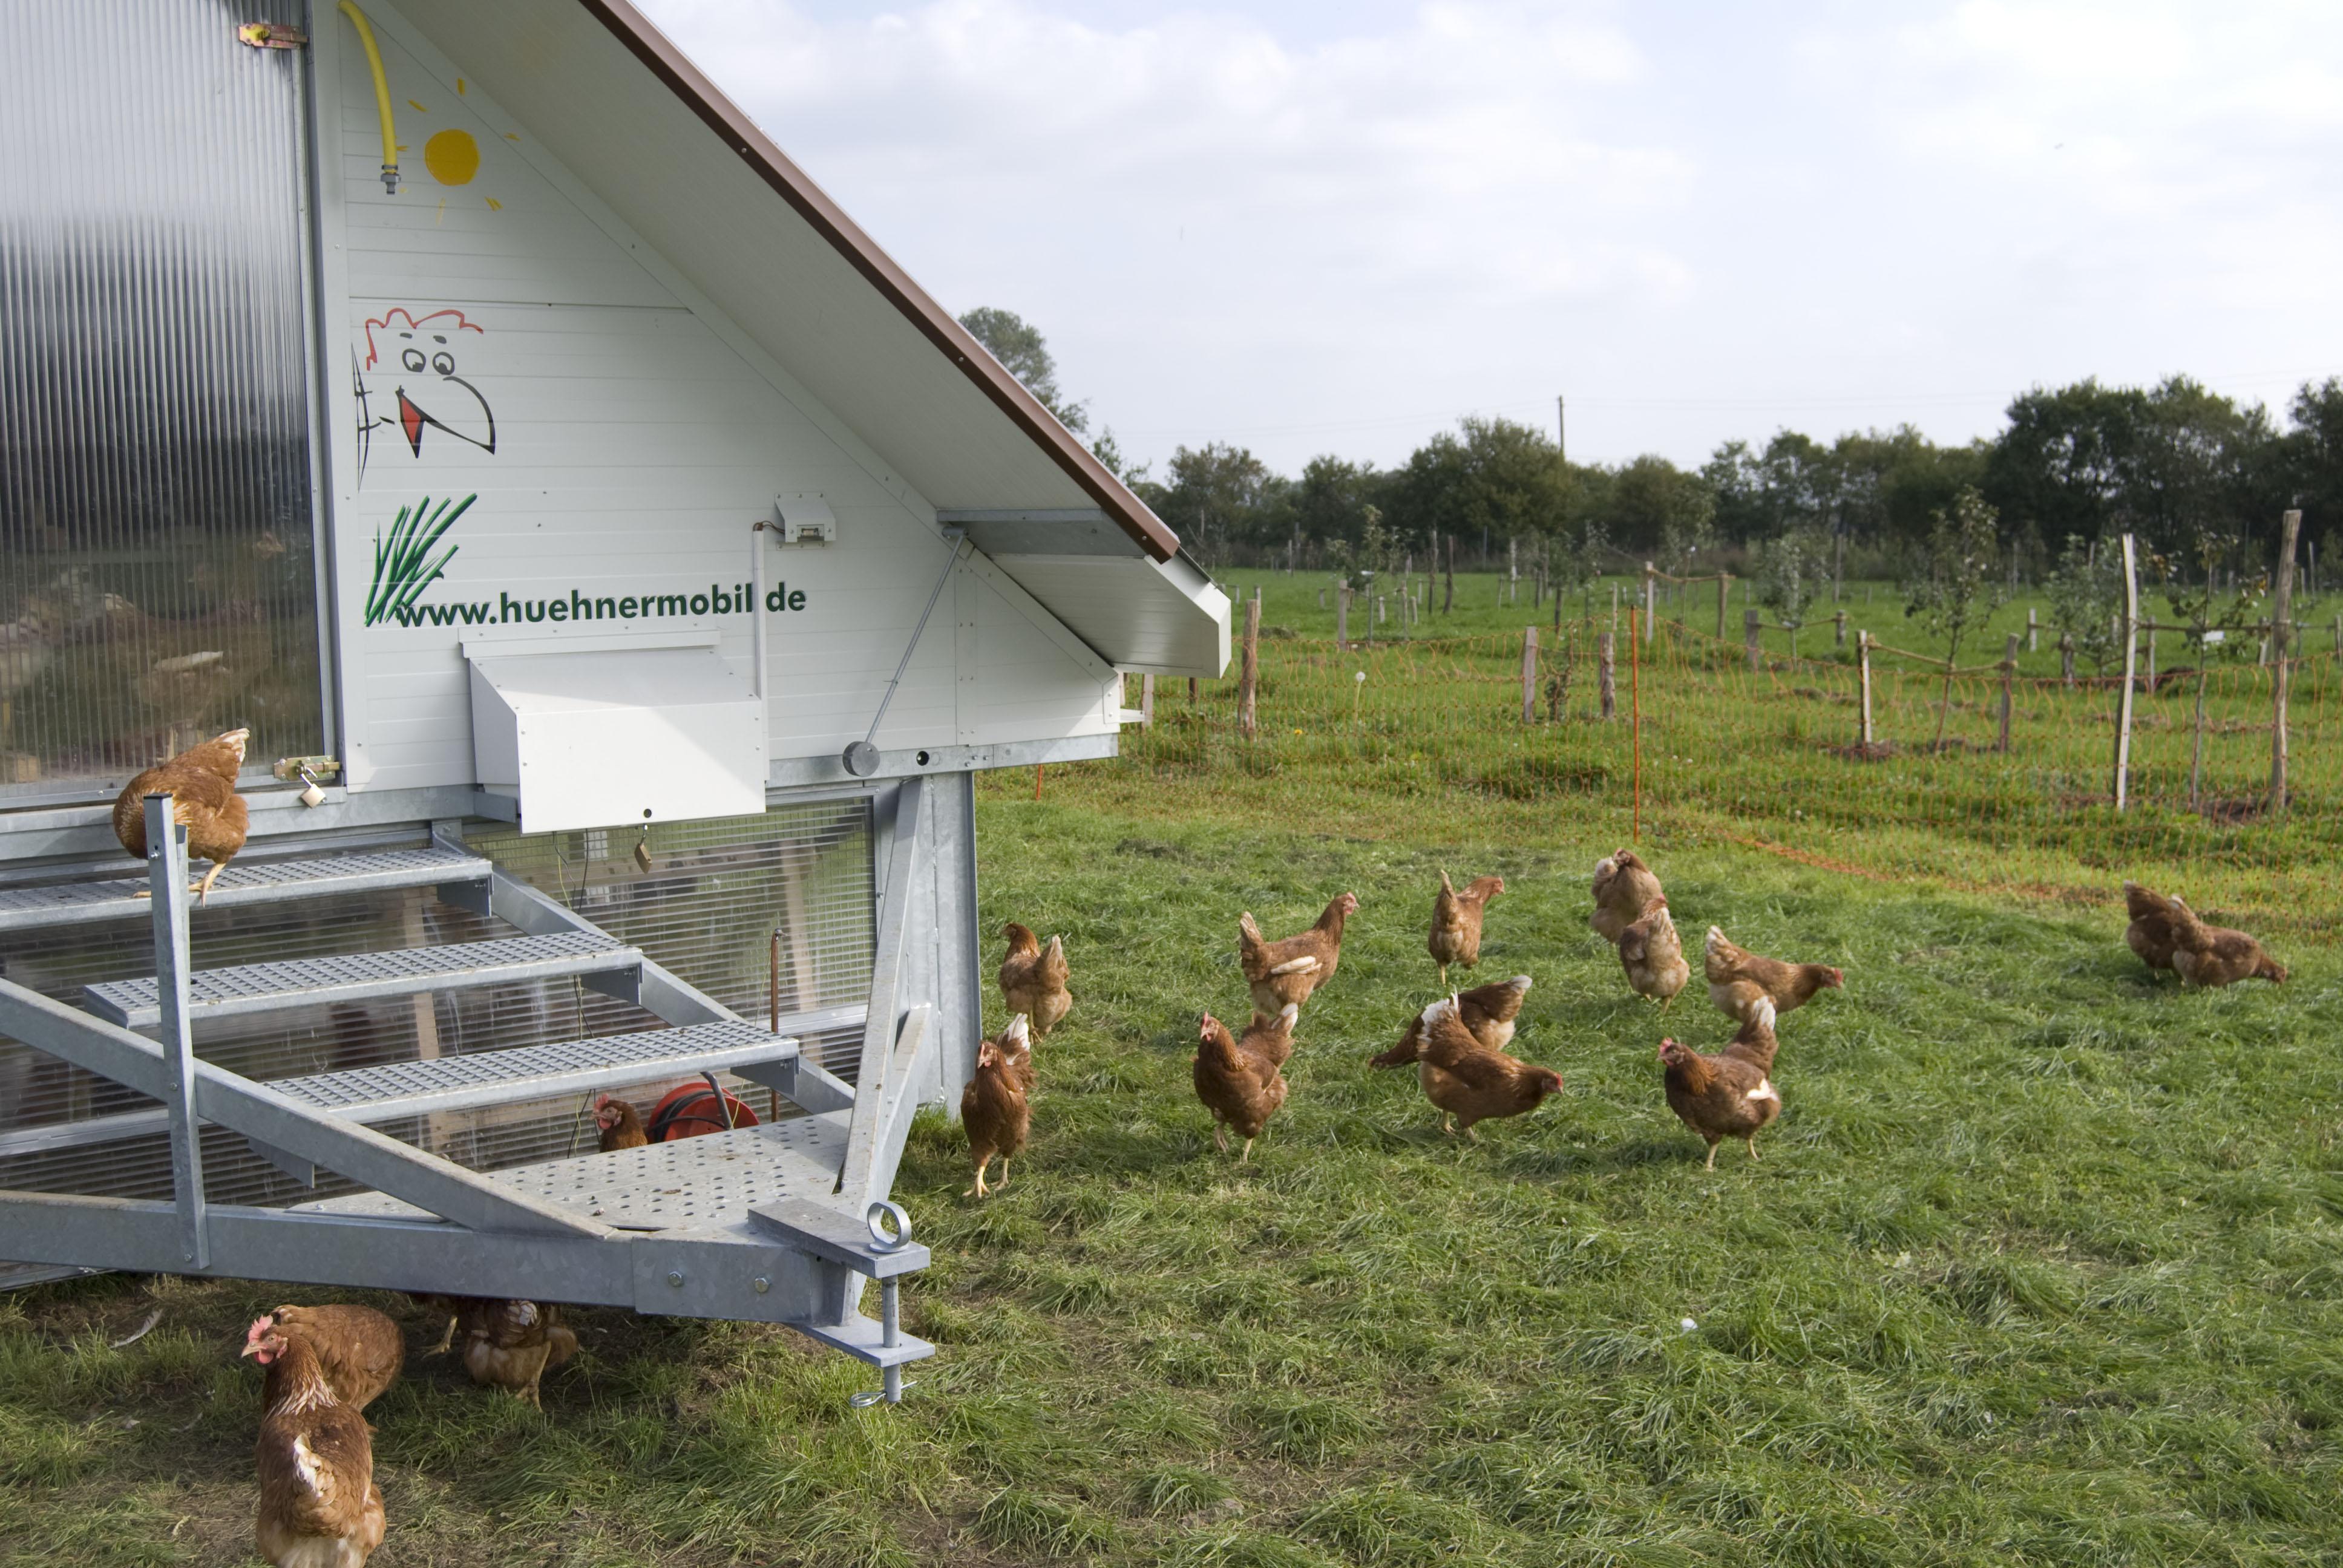 ELSTER-WERKSTÄTTEN gemeinnützige GmbH